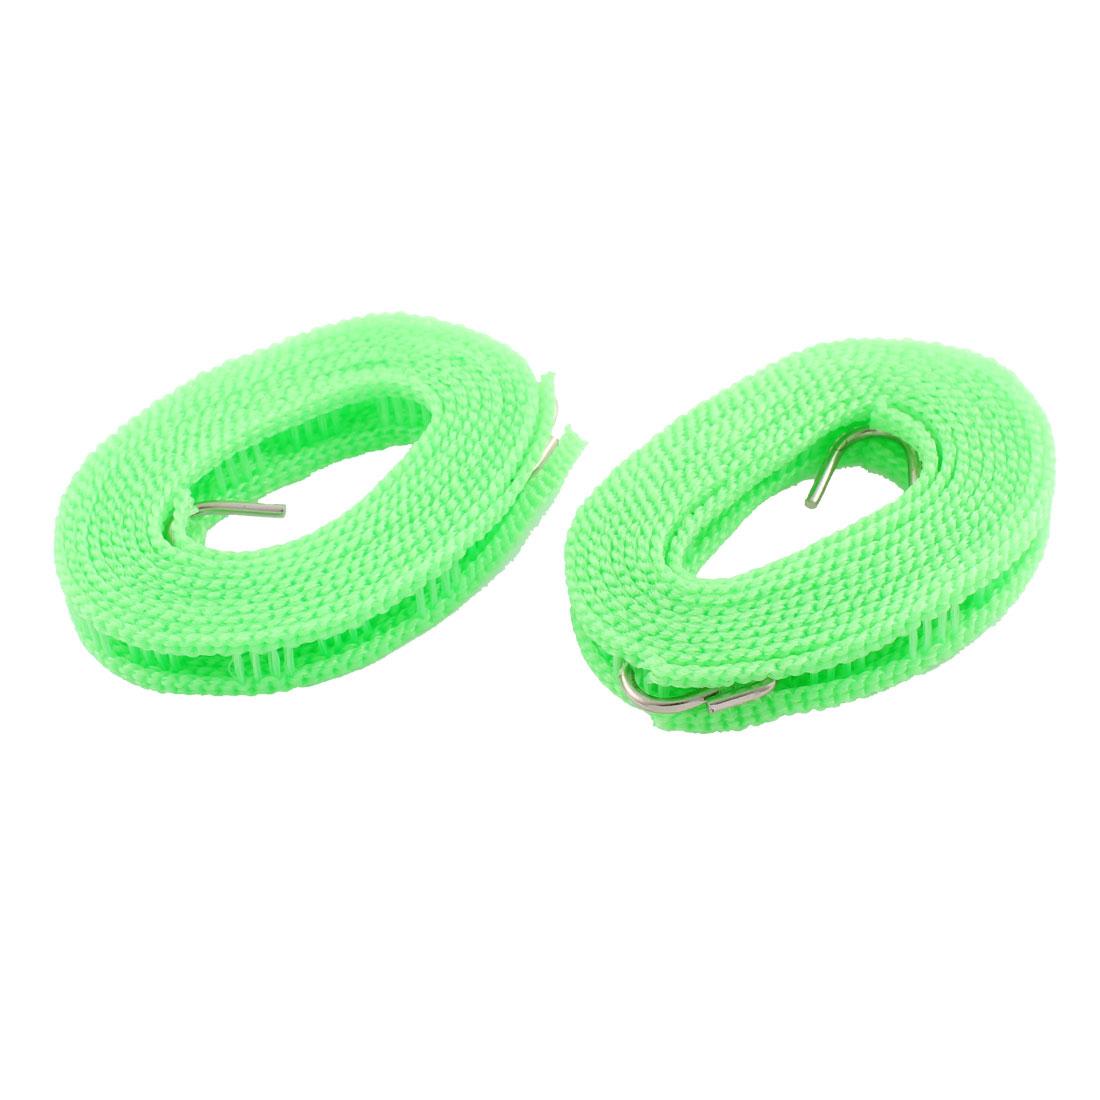 2 Pcs Metal Hooks Windproof Nonslip Flexible Braided Clothesline Green 2M